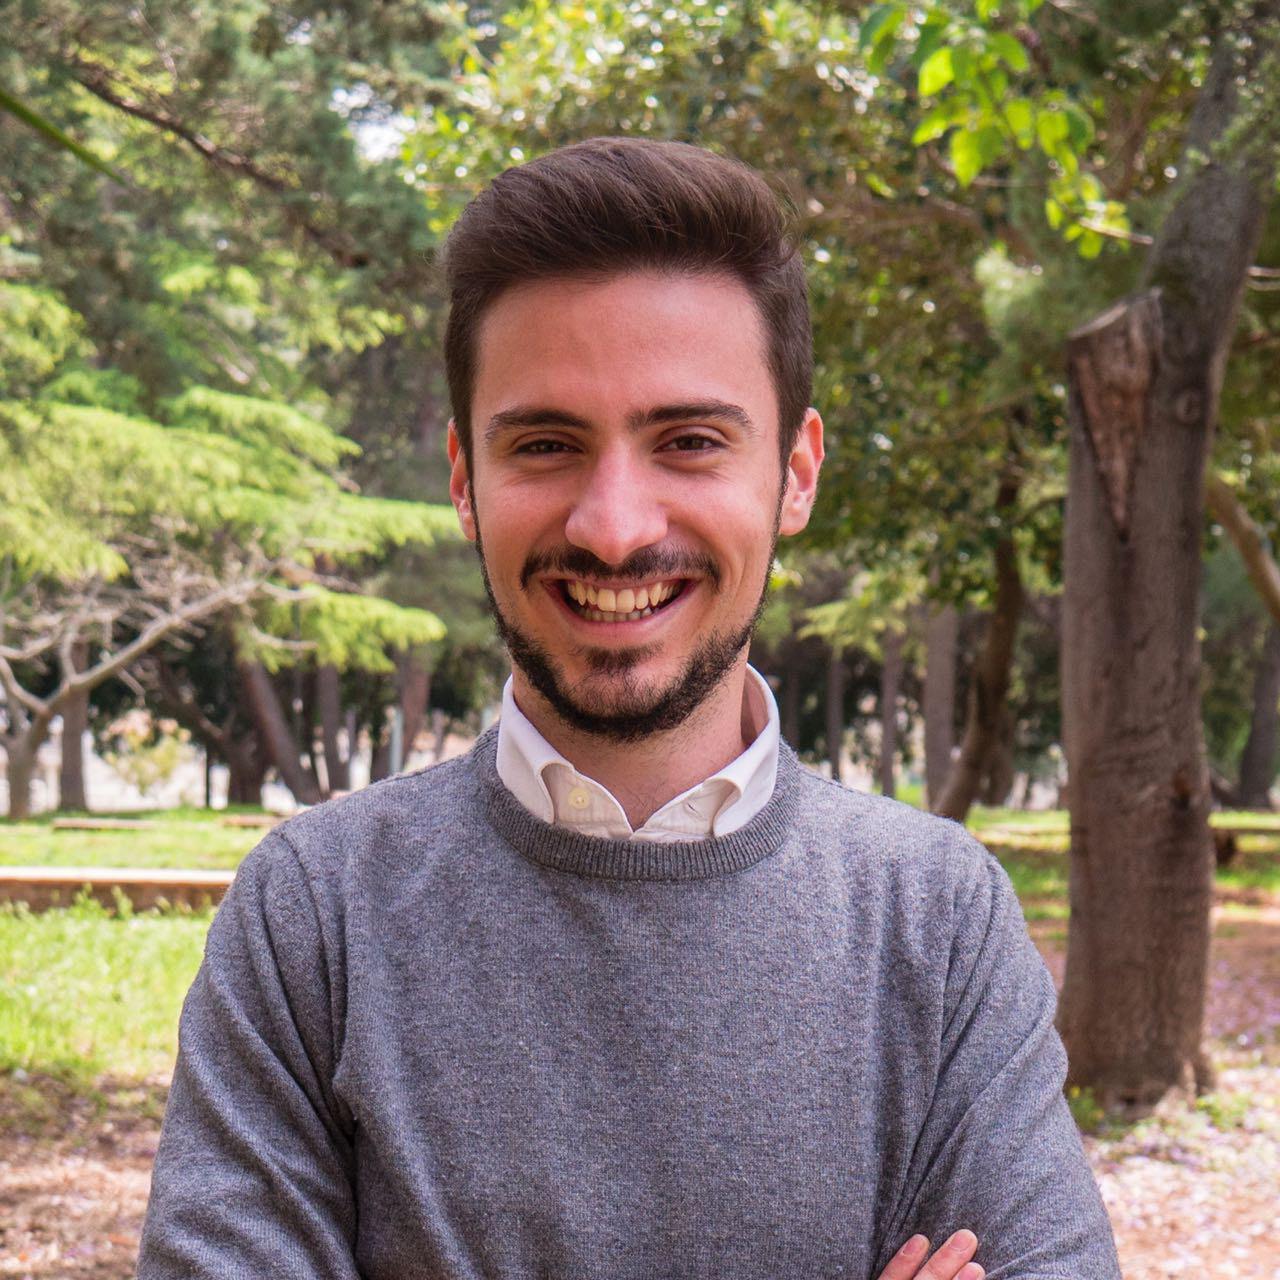 Matteo Norcia